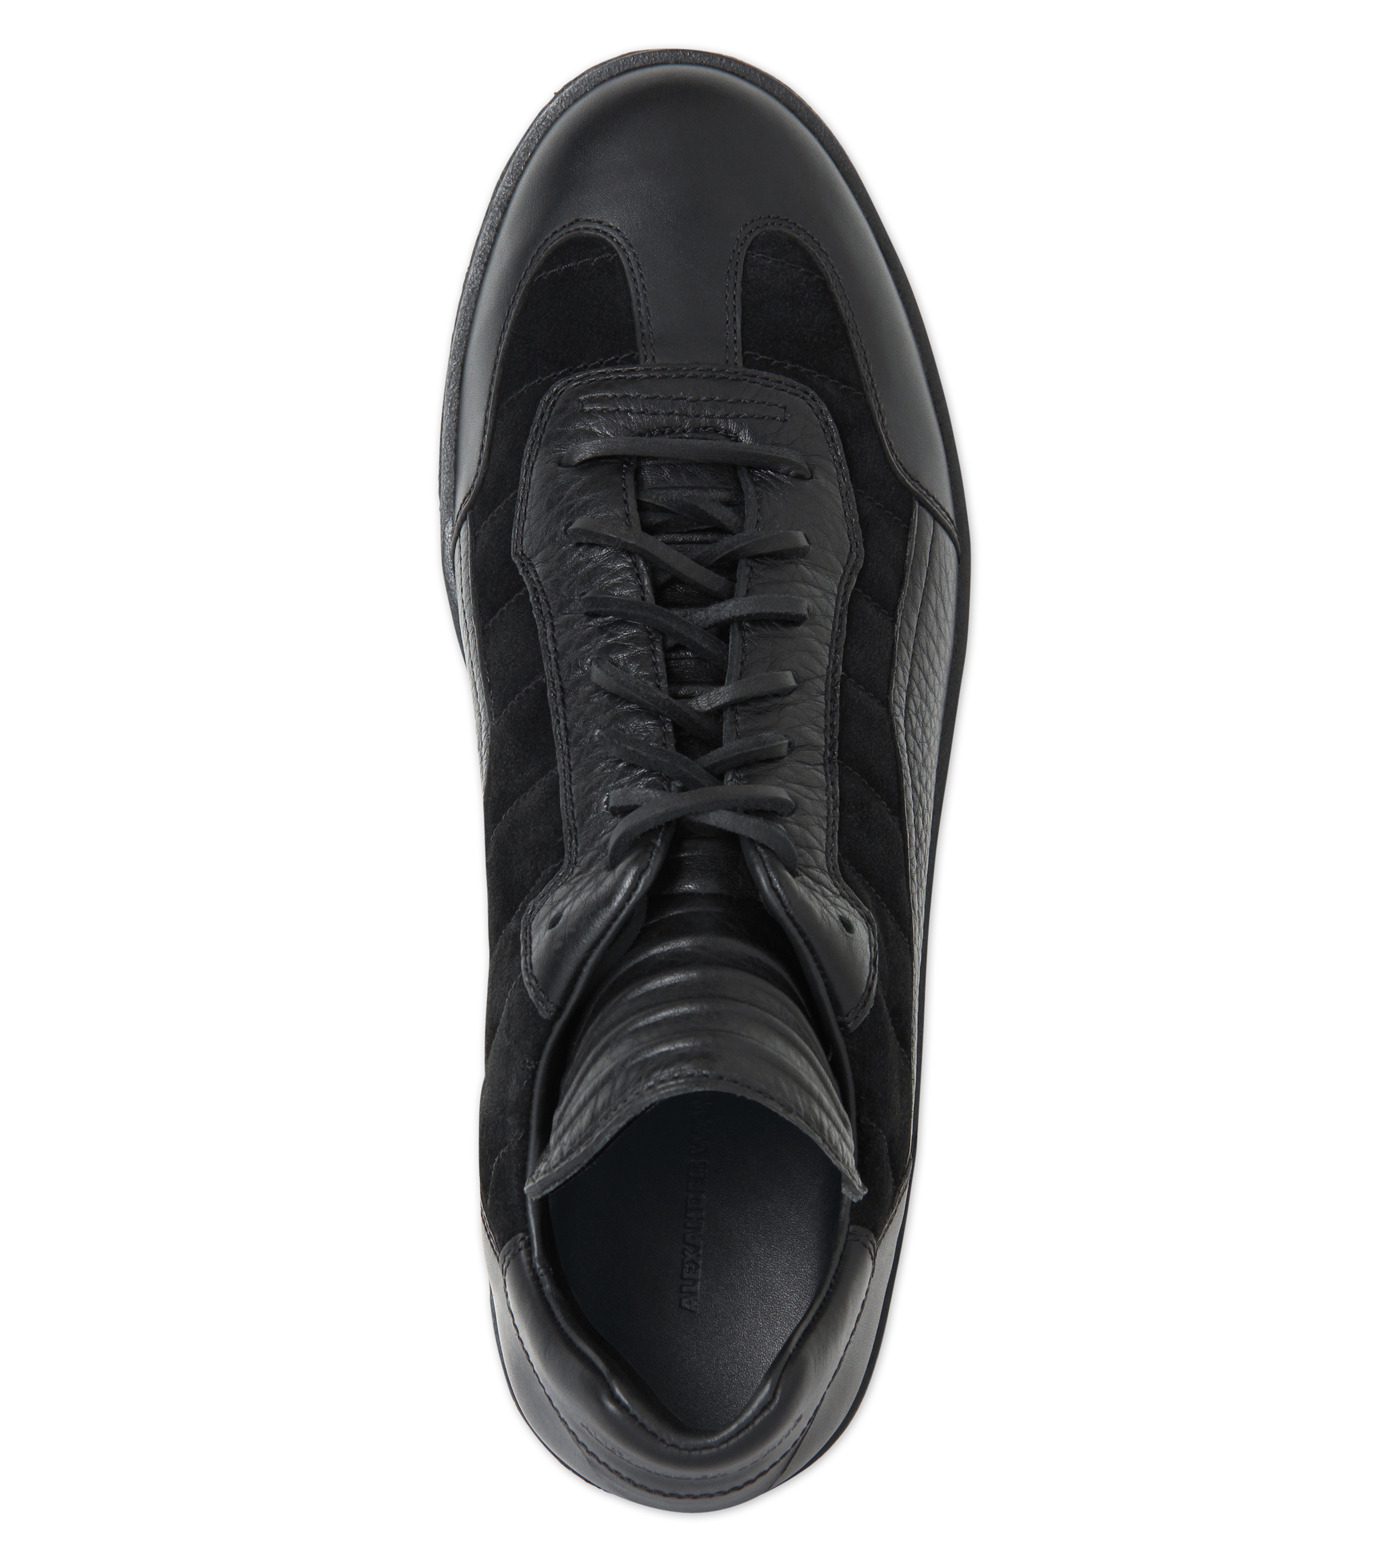 Alexander Wang(アレキサンダーワン)のEden Low-BLACK(シューズ/shoes)-311103S16-13 拡大詳細画像4